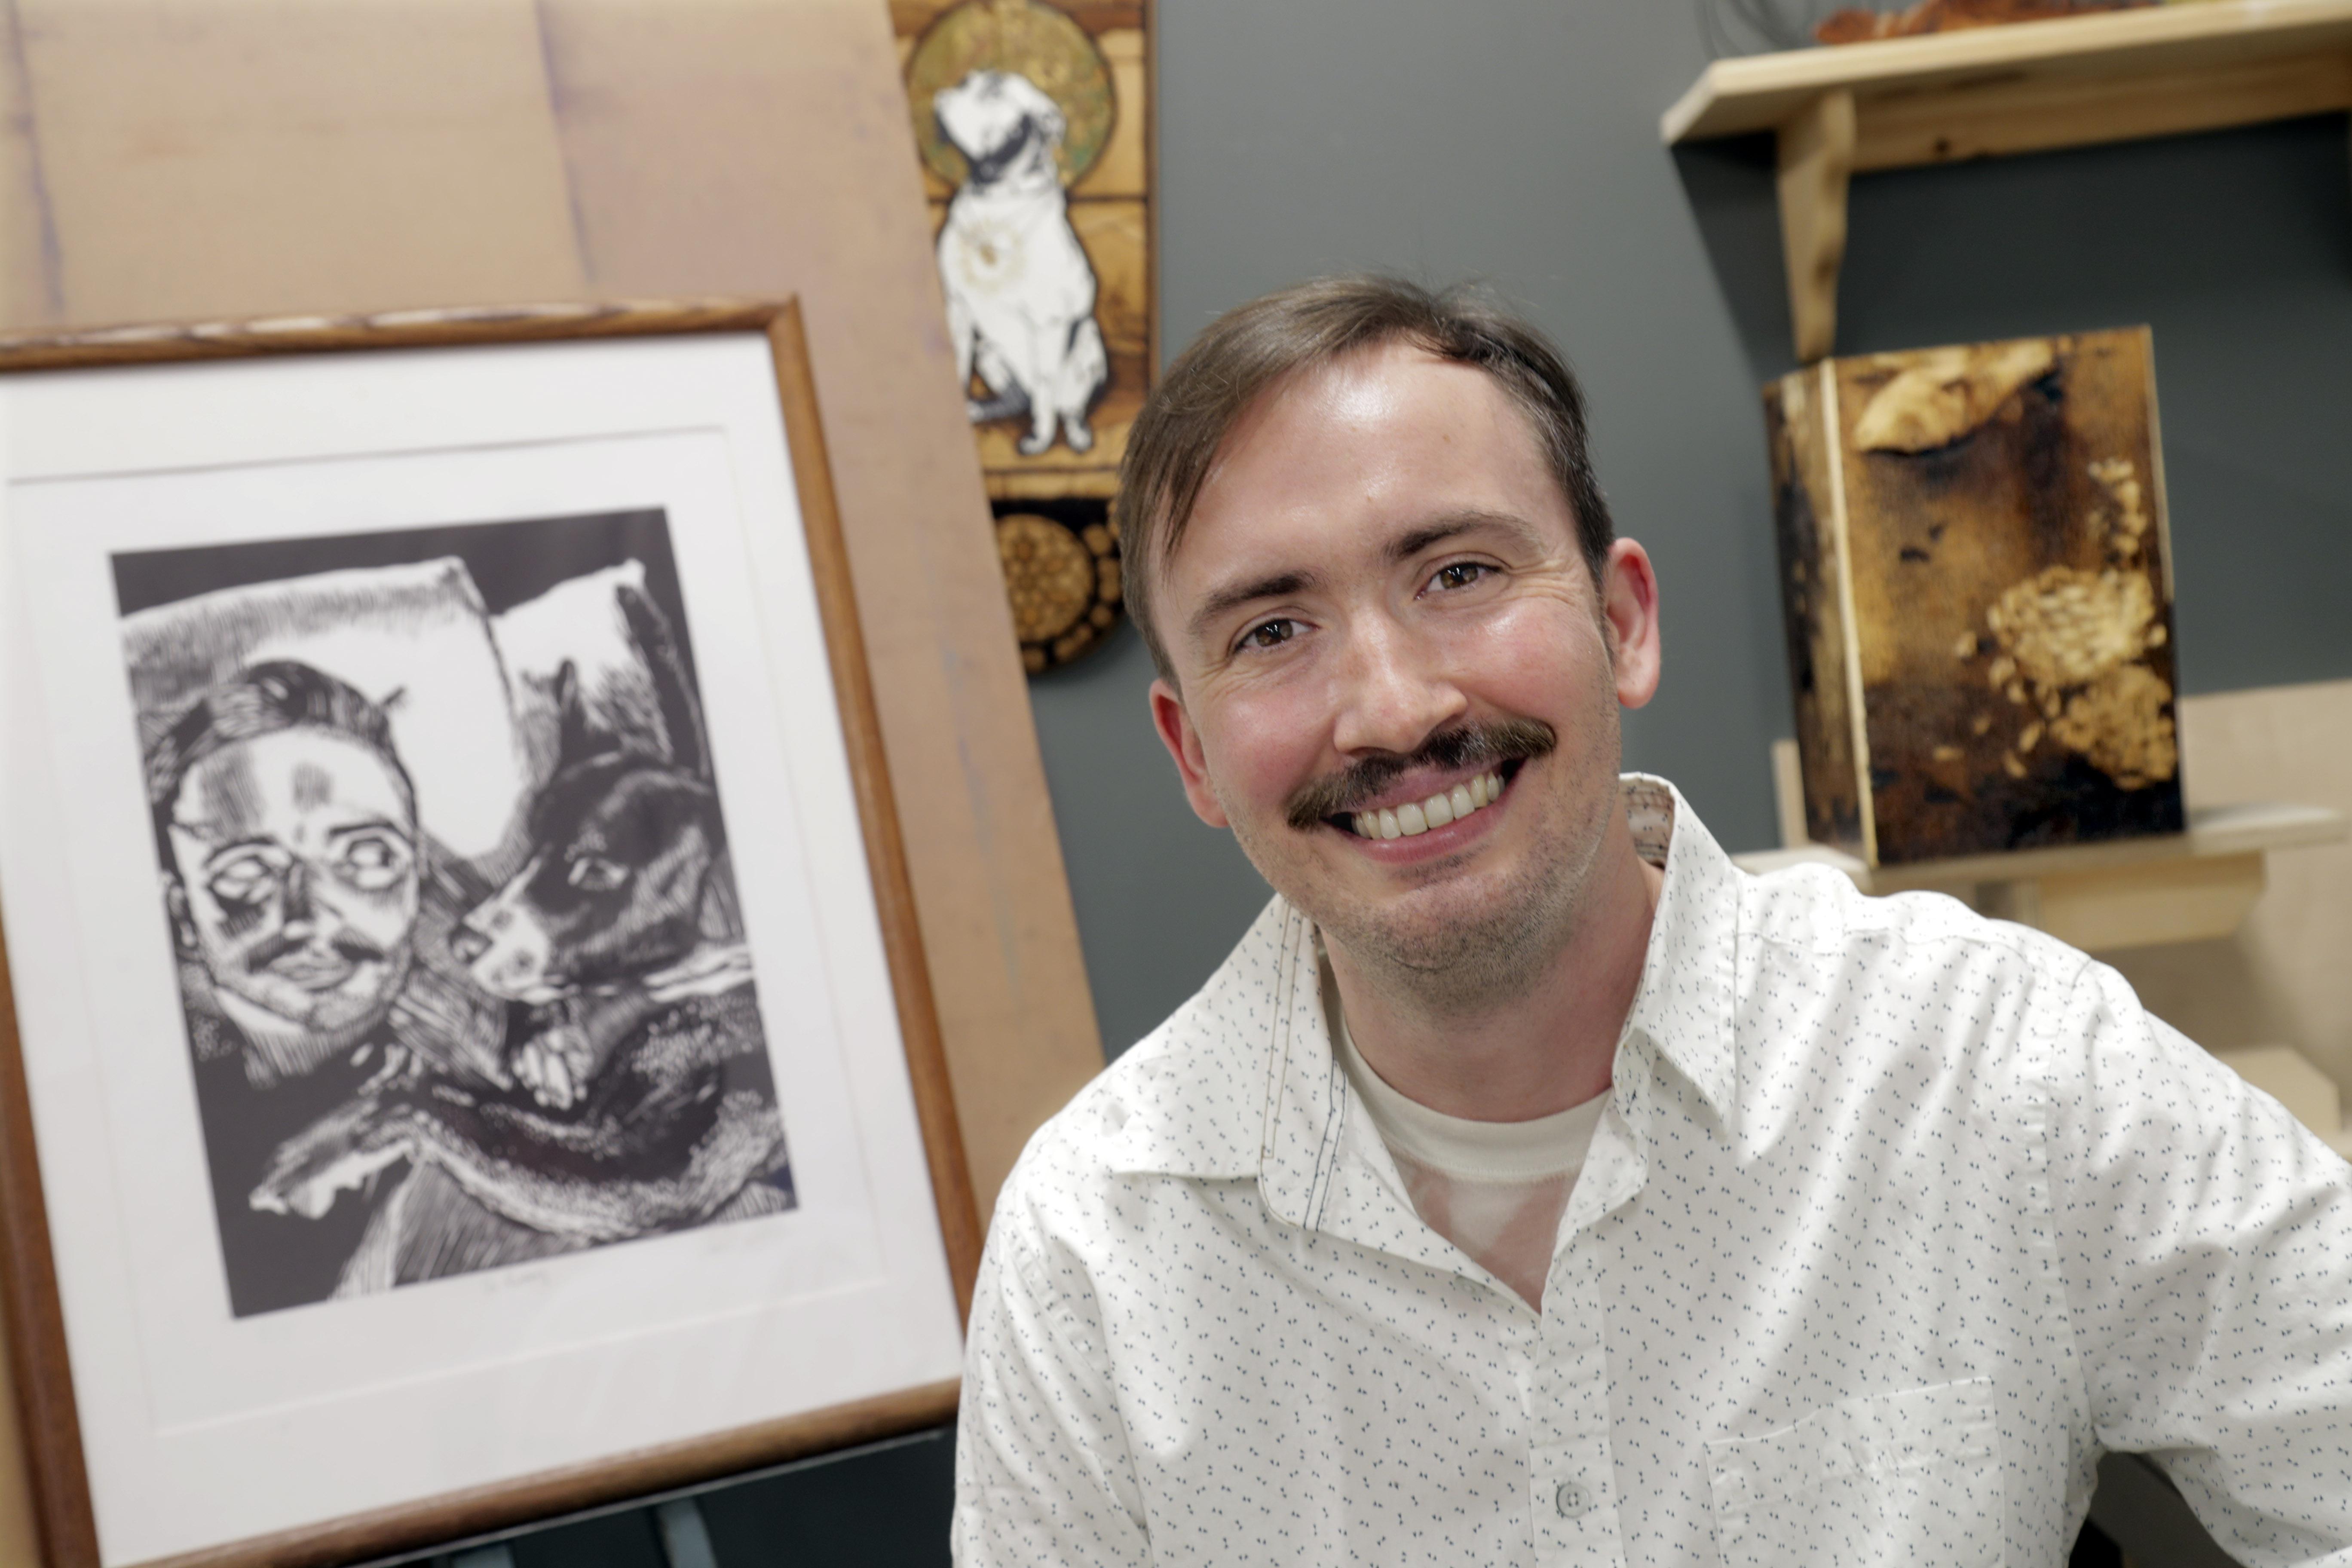 UA Little Rock studio art major Caleb LeFevre was awarded the Linda Blaine Flake Endowed Art Scholarship by philanthropist Leslye Shellam in celebration of World Art Day. Photo by Ben Krain.